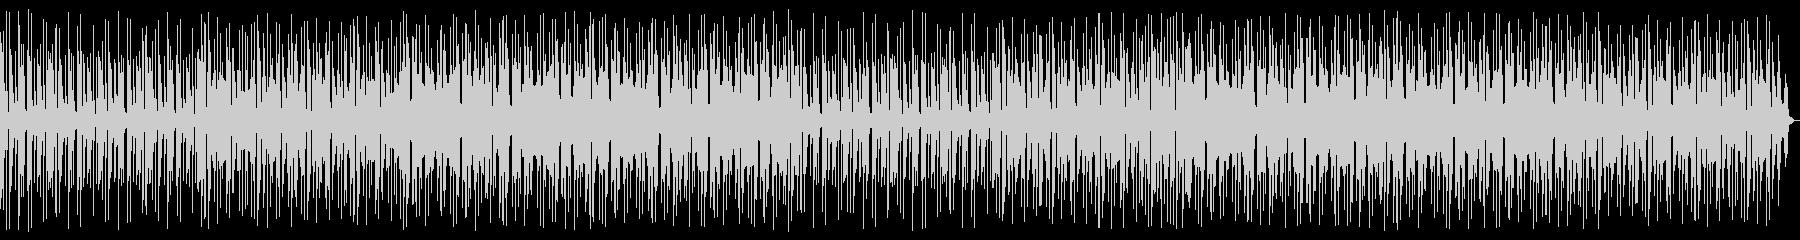 Digital. graphic. Techno_3's unreproduced waveform